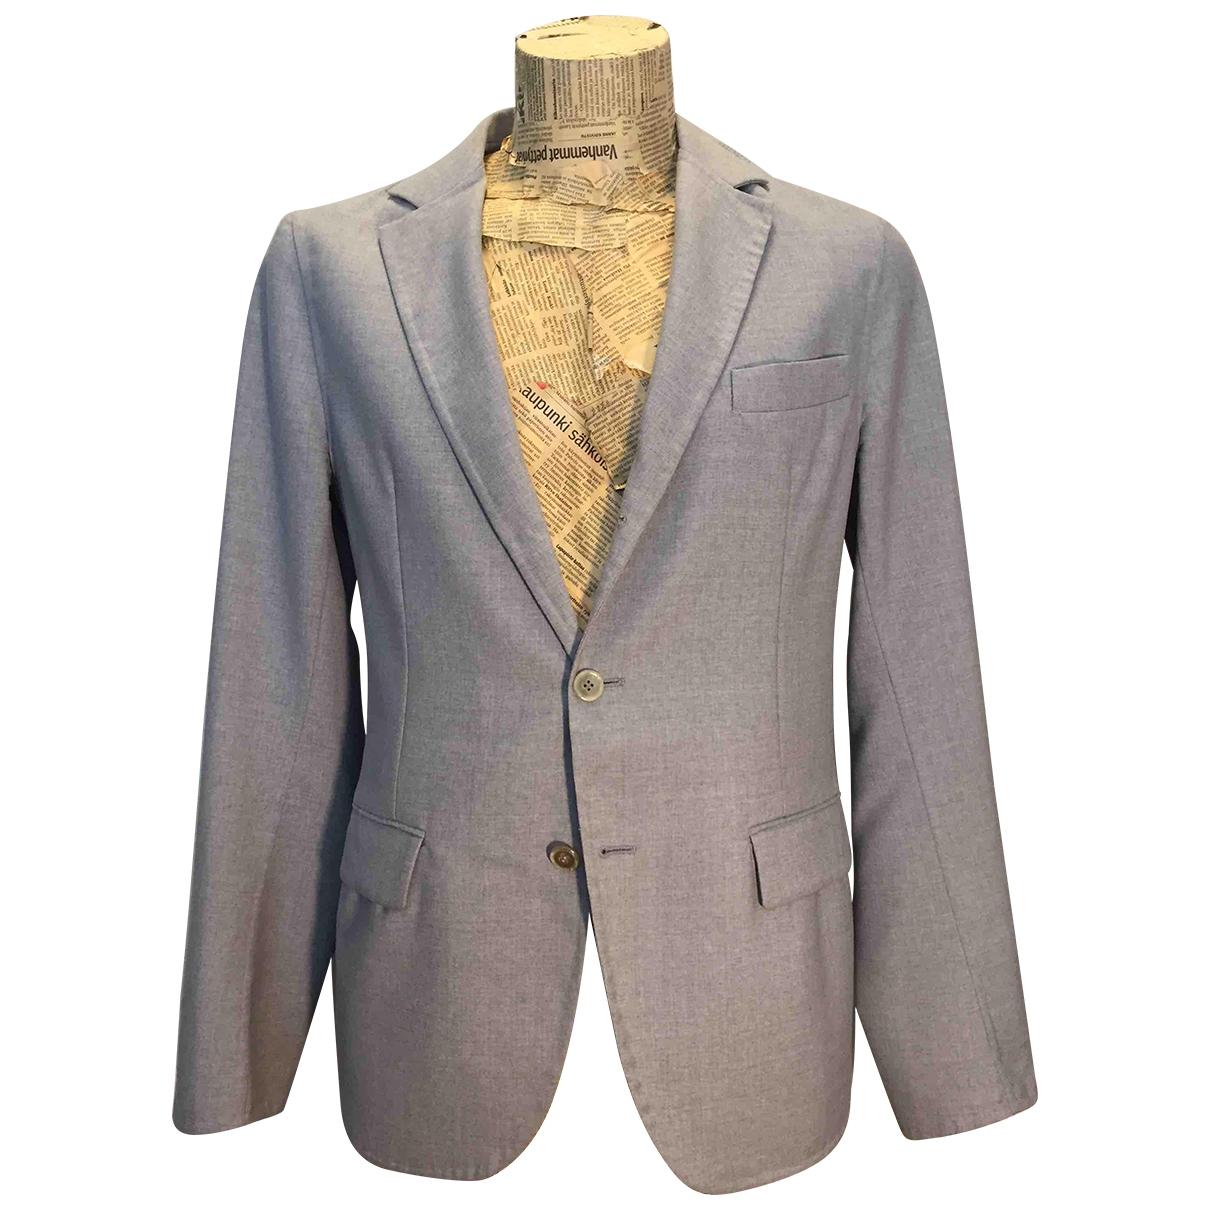 Ermanno Scervino \N Jacke in  Grau Wolle